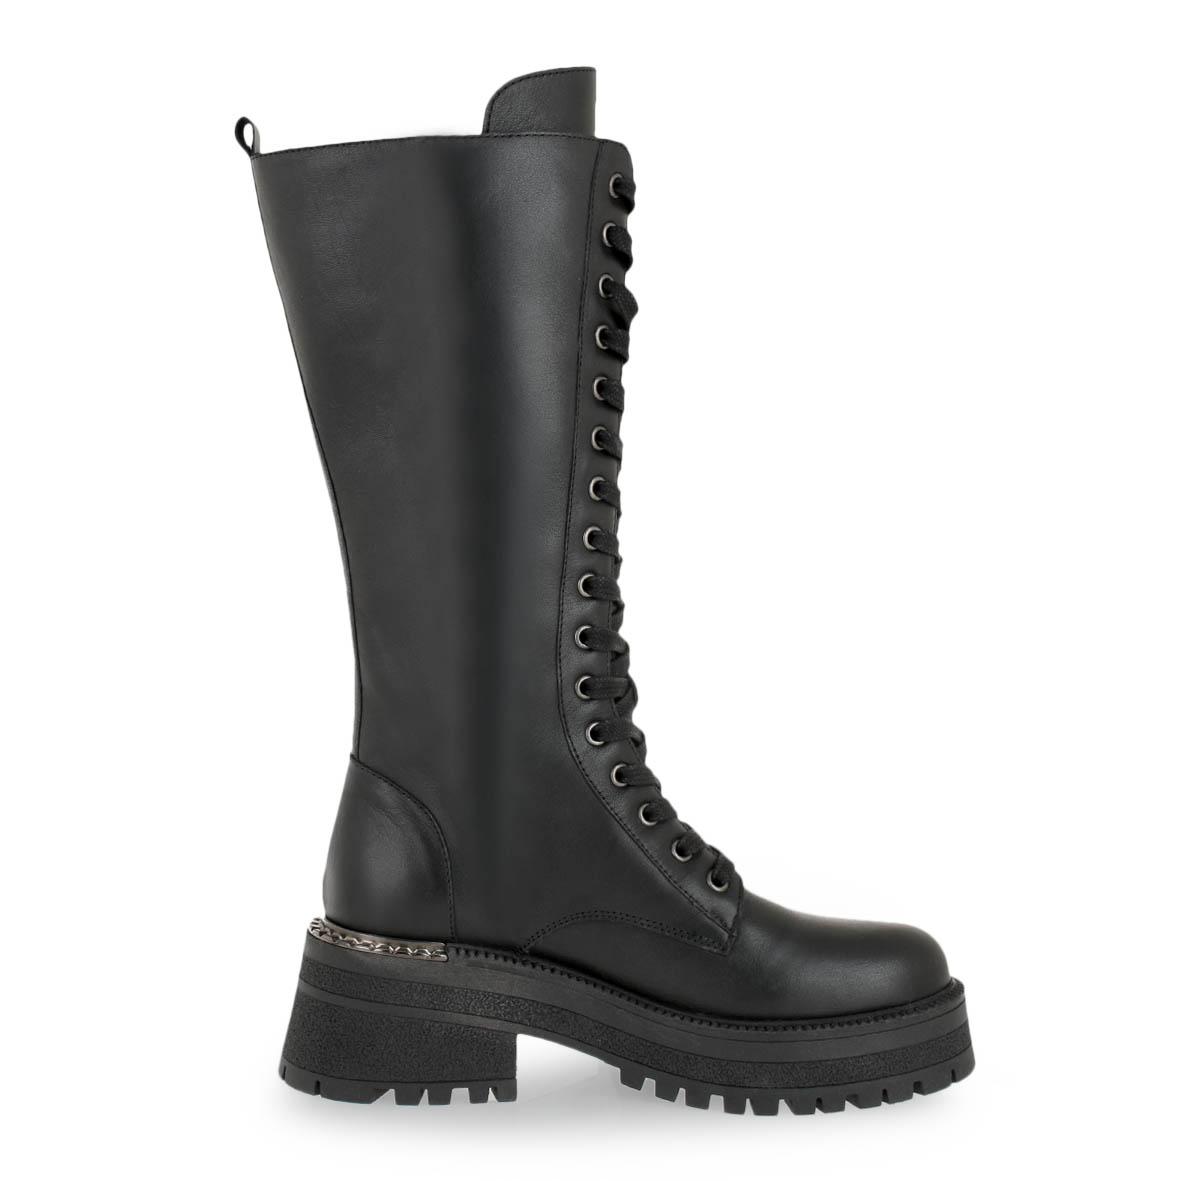 COMBAT BOOTS σχέδιο: L21007433